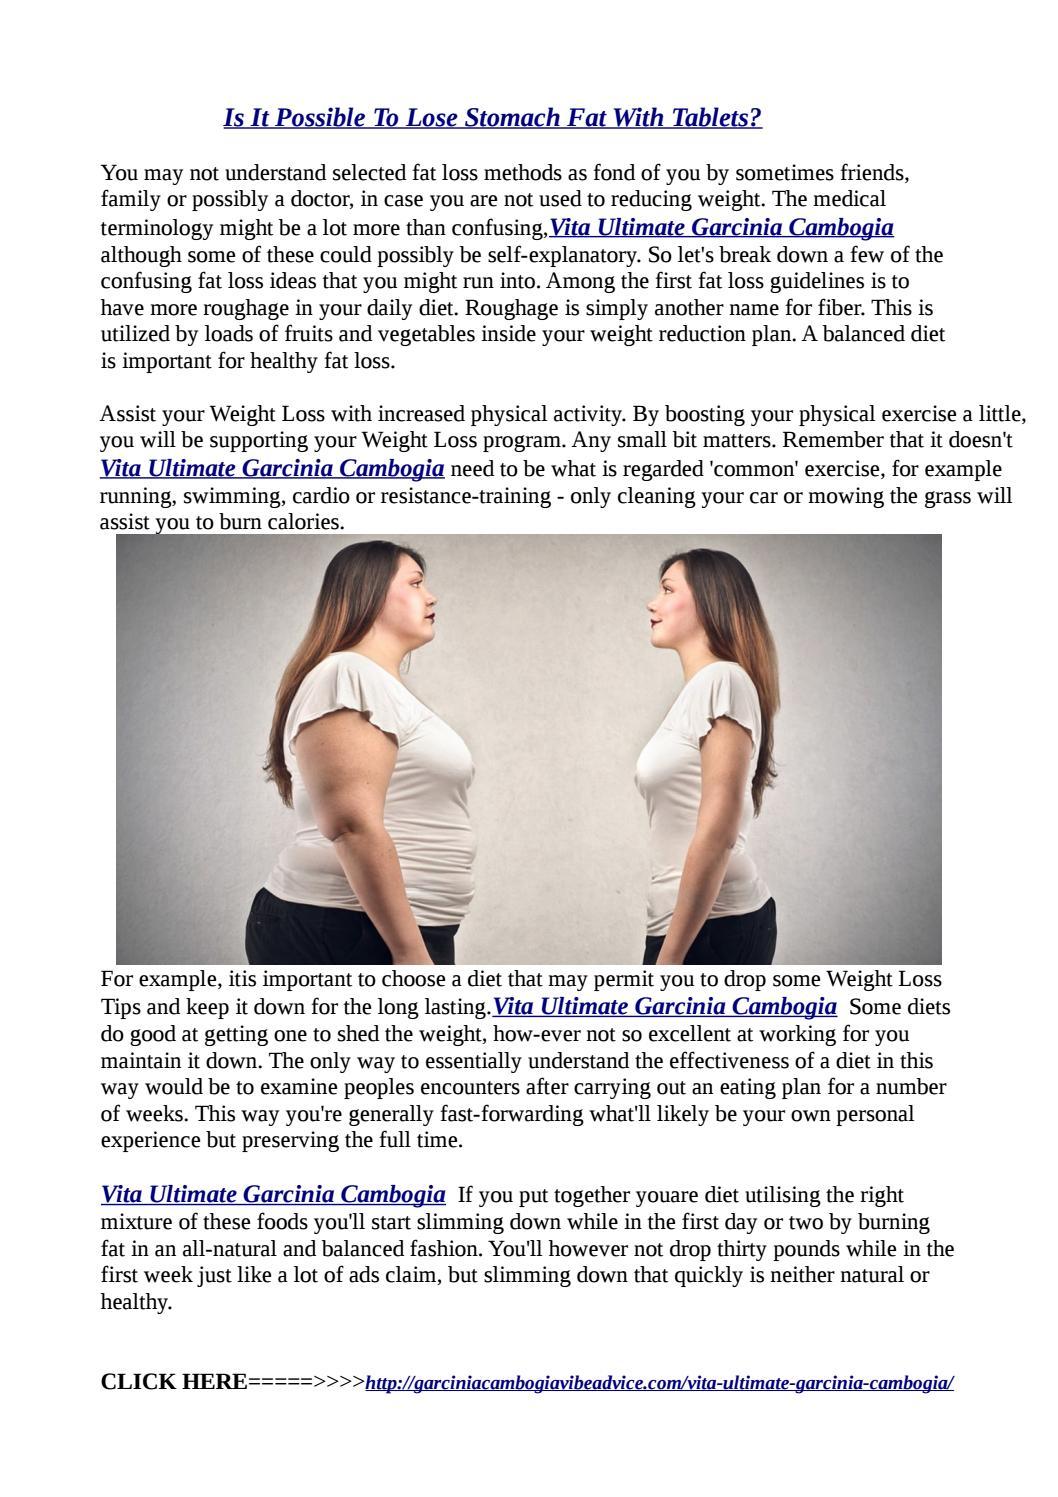 vita diet weight loss program